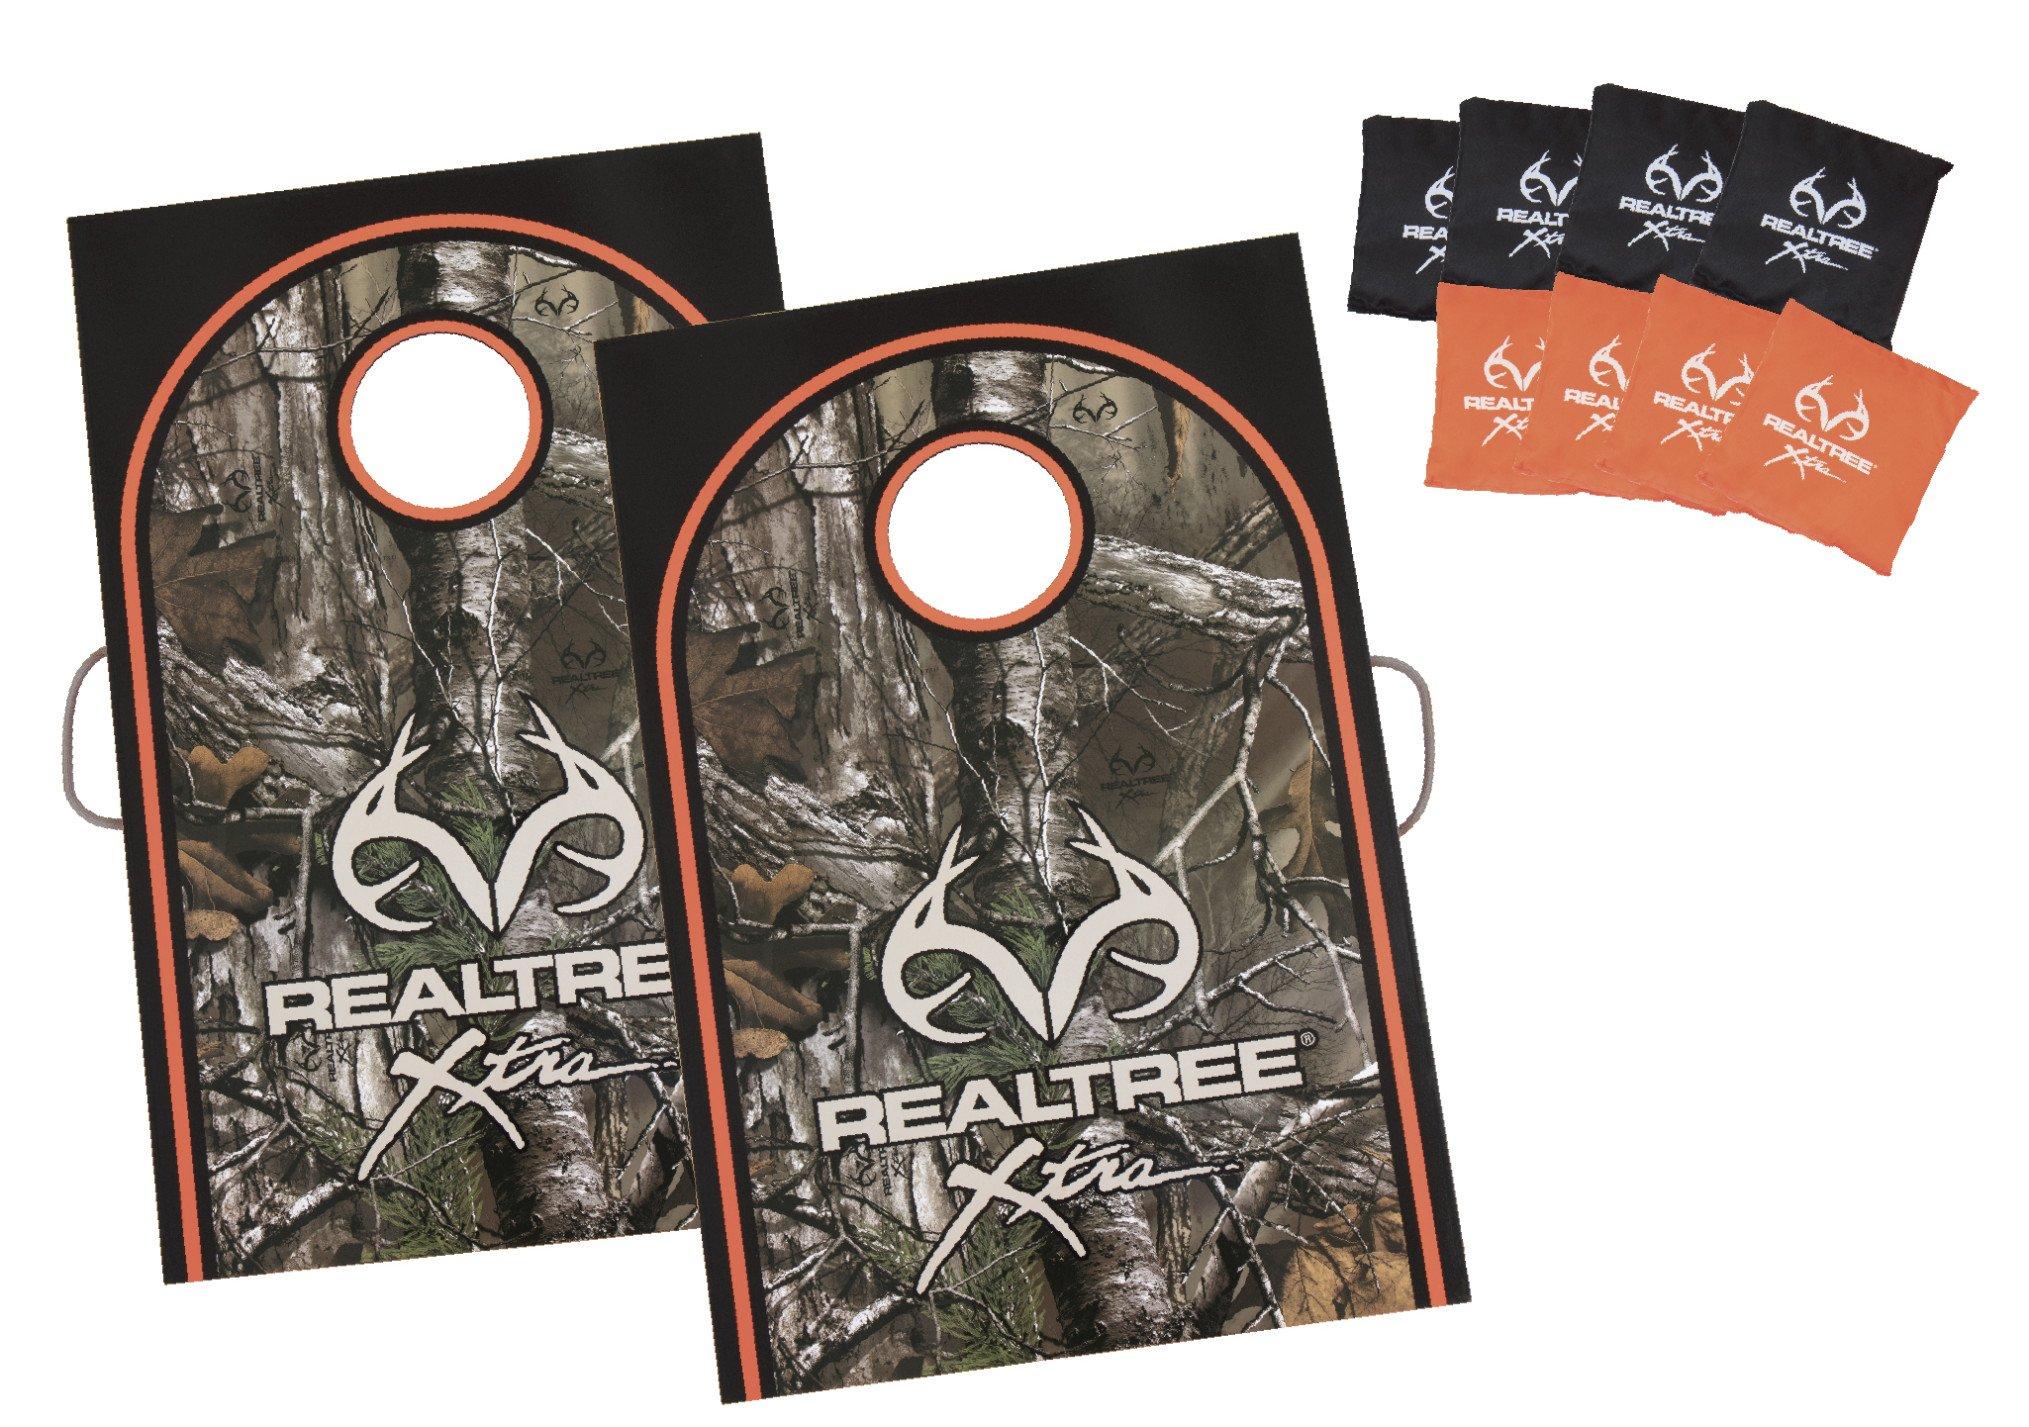 Triumph Realtree Tournament Bag Toss